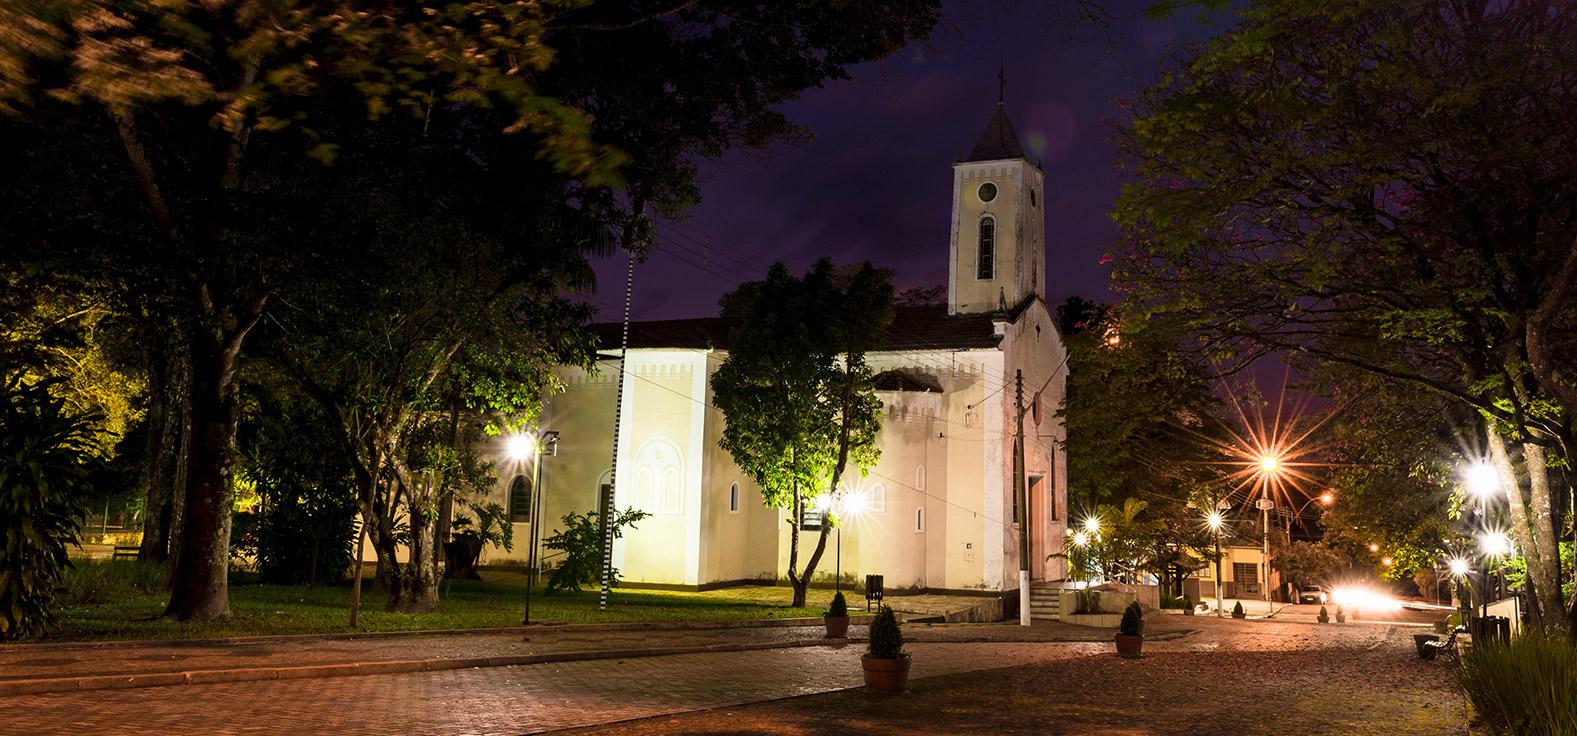 Igreja Matriz em Analândia | Portal Serra do Itaquerí